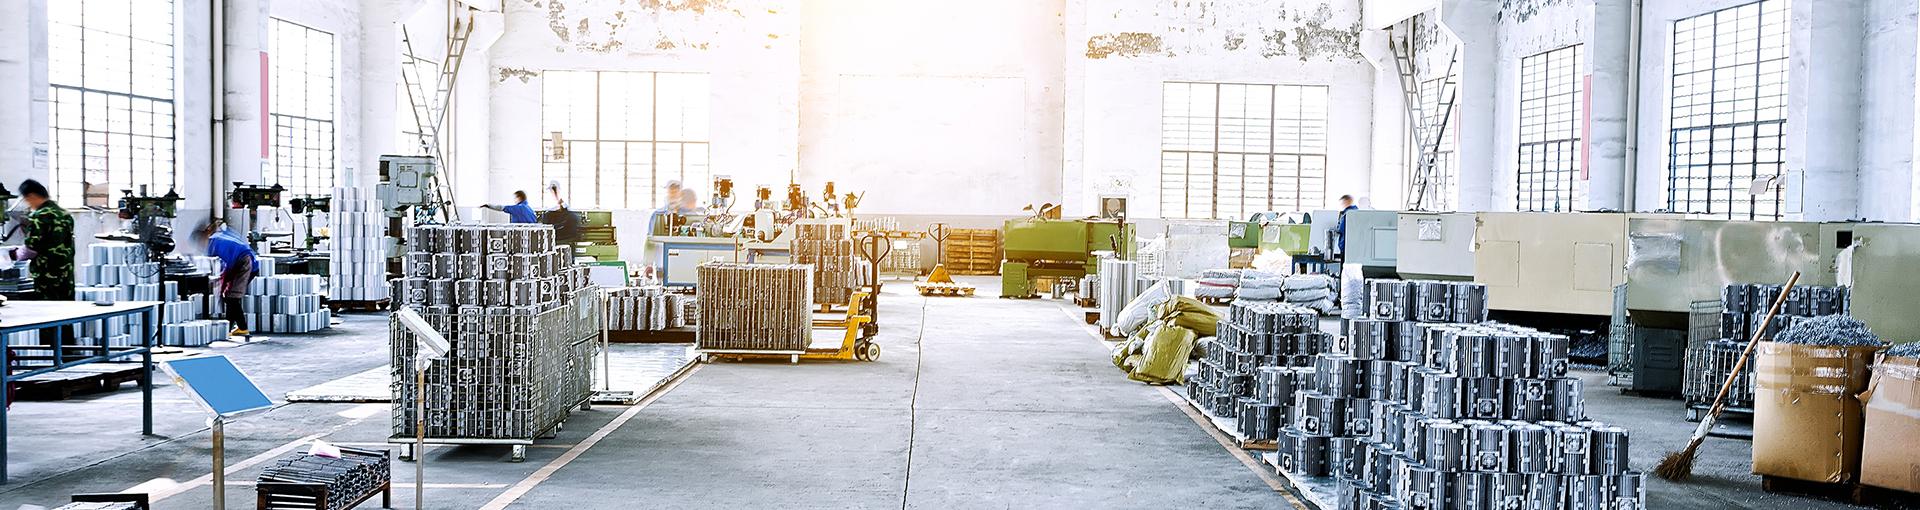 Regal Industrial Air Conditioning